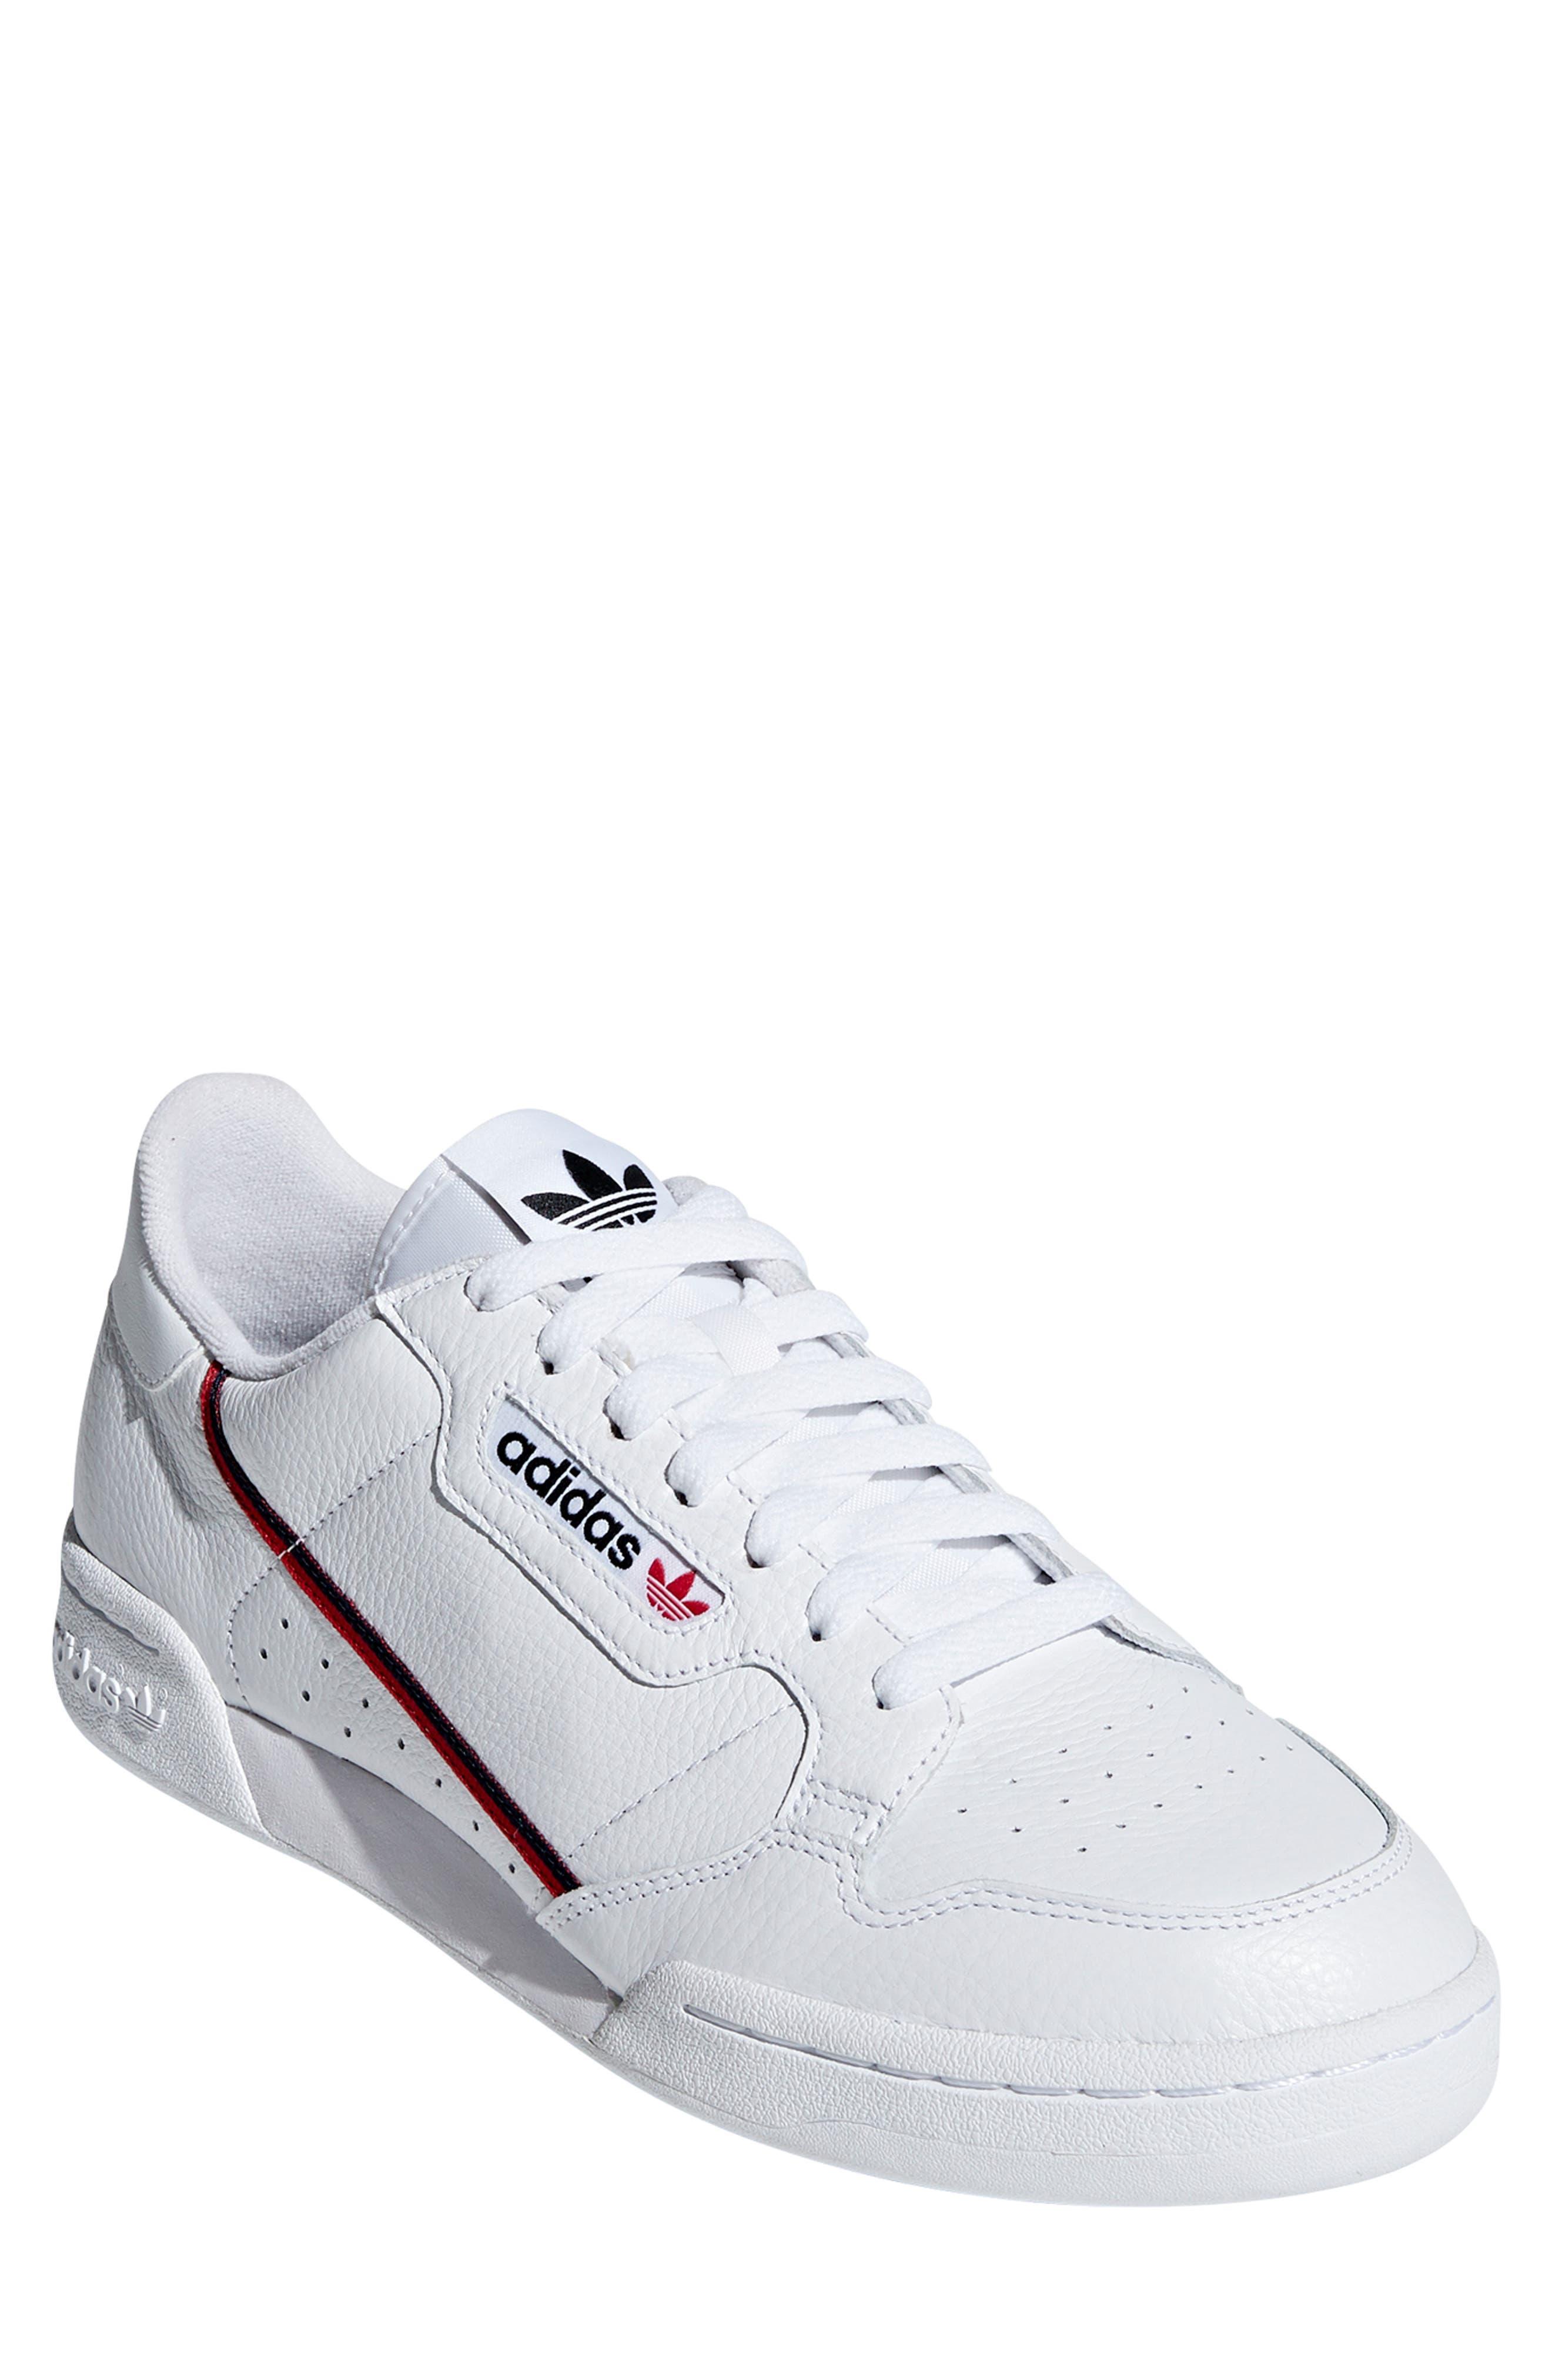 Men's adidas Sneakers \u0026 Athletic Shoes